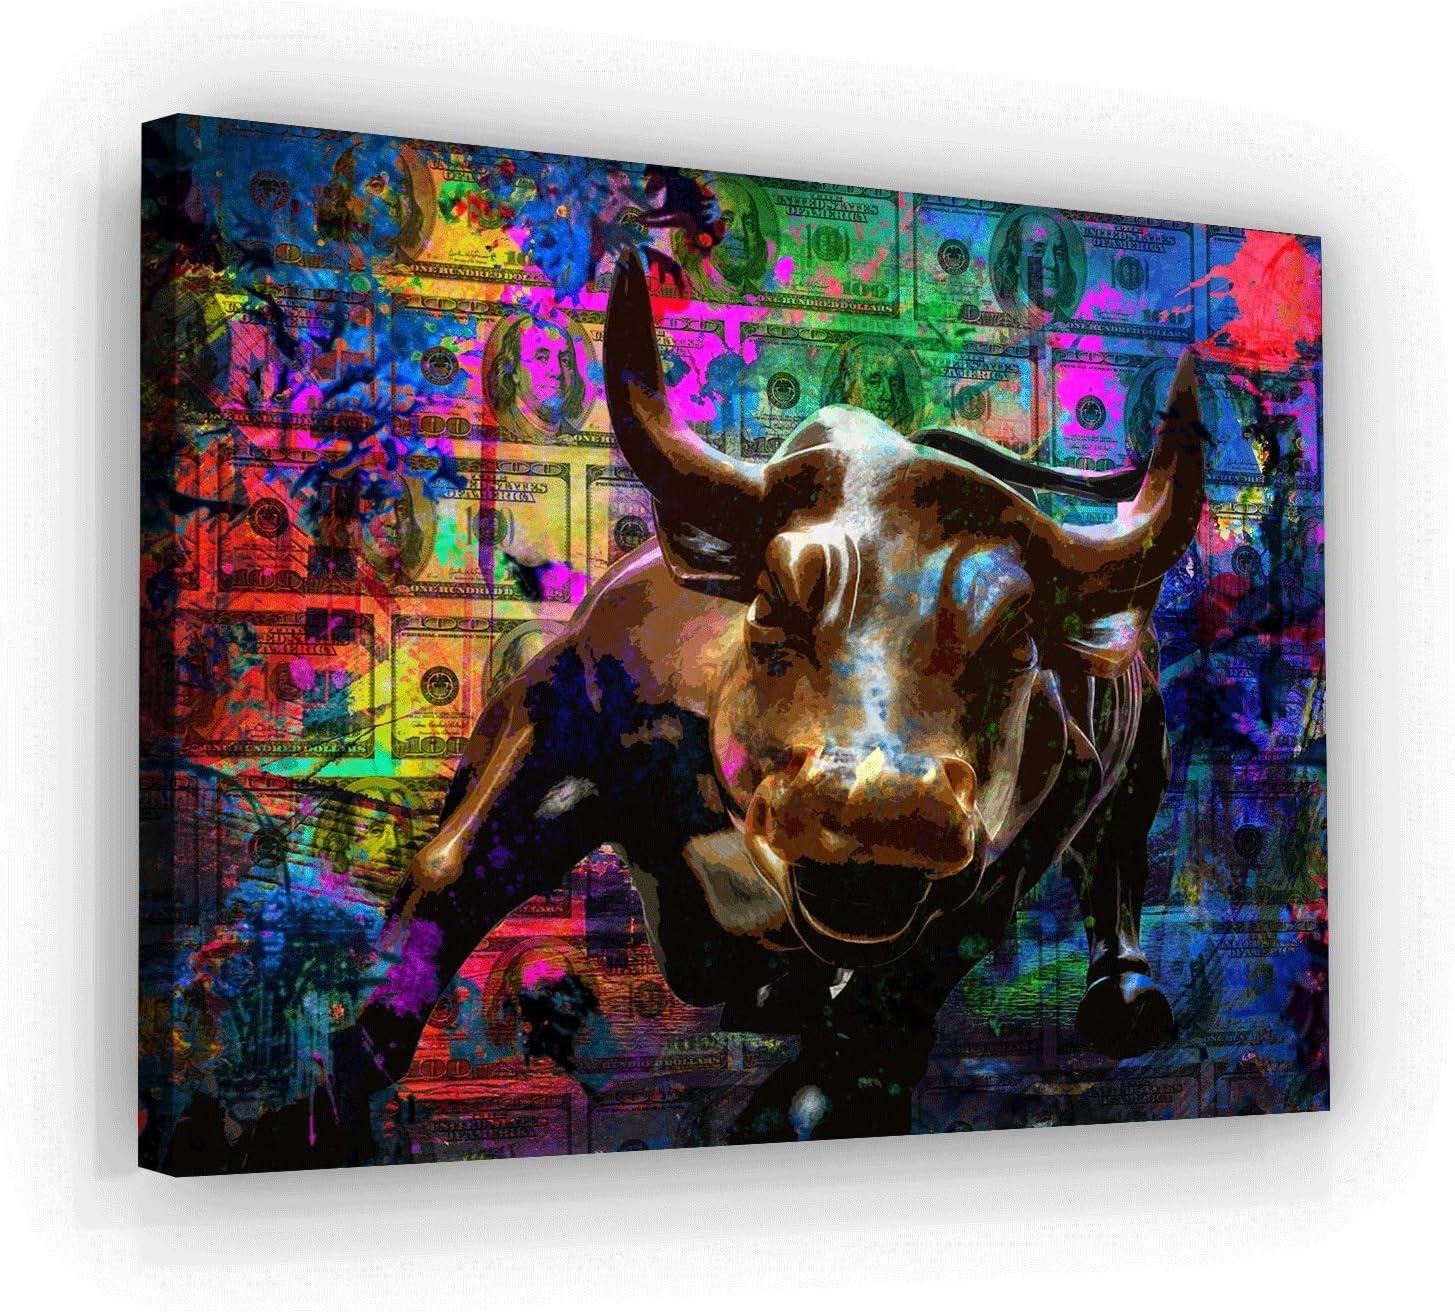 "SuccessHuntersPrints Charging Bull Canvas Print Office Decor Pop Art Money Motivation Wall Street Culture Inspirational Motivational Home Decoration Entrepreneur (30"" x 40"")"